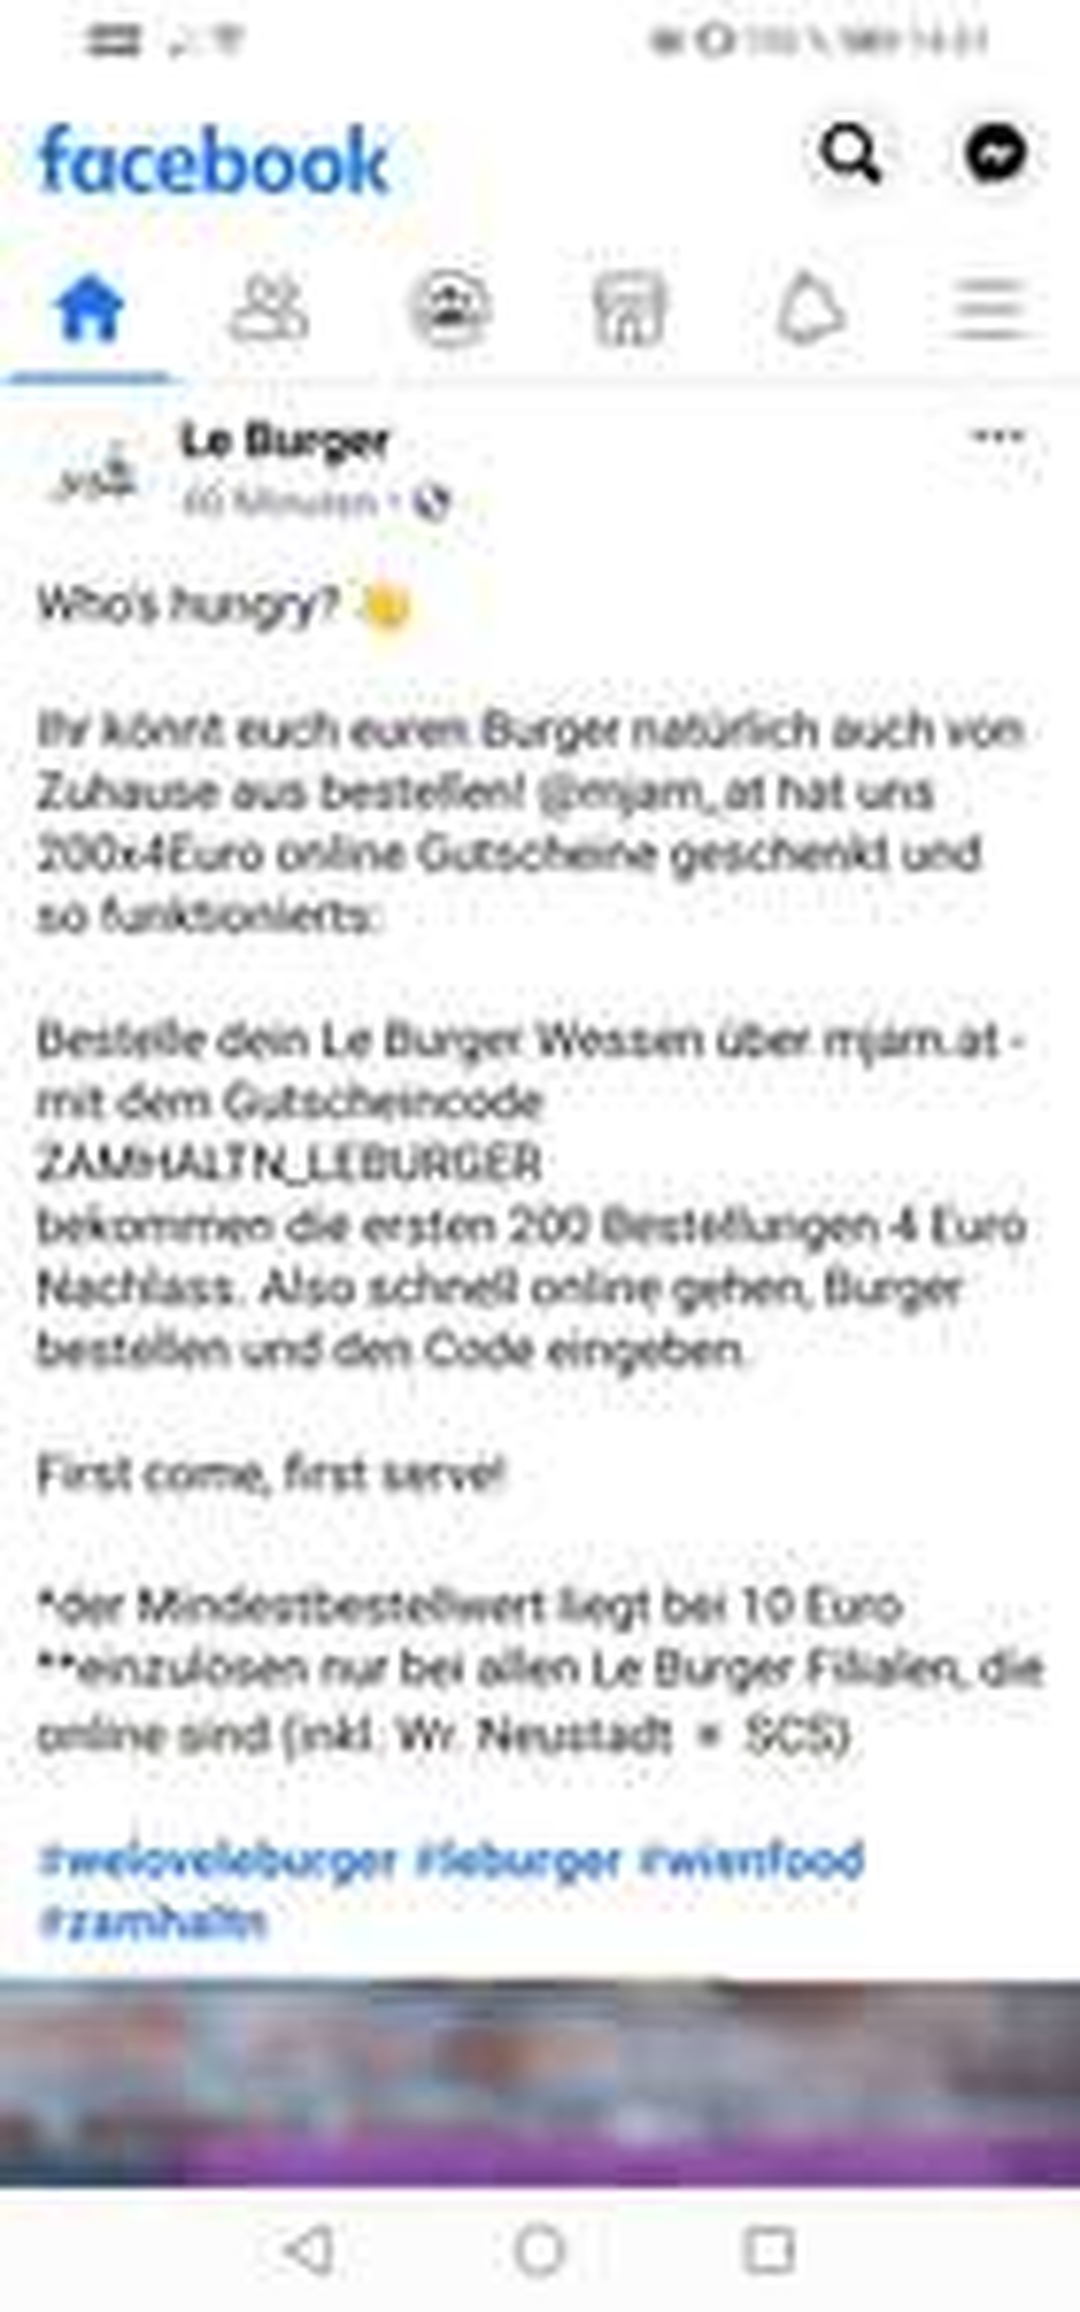 4€ Mjam bei Leburger